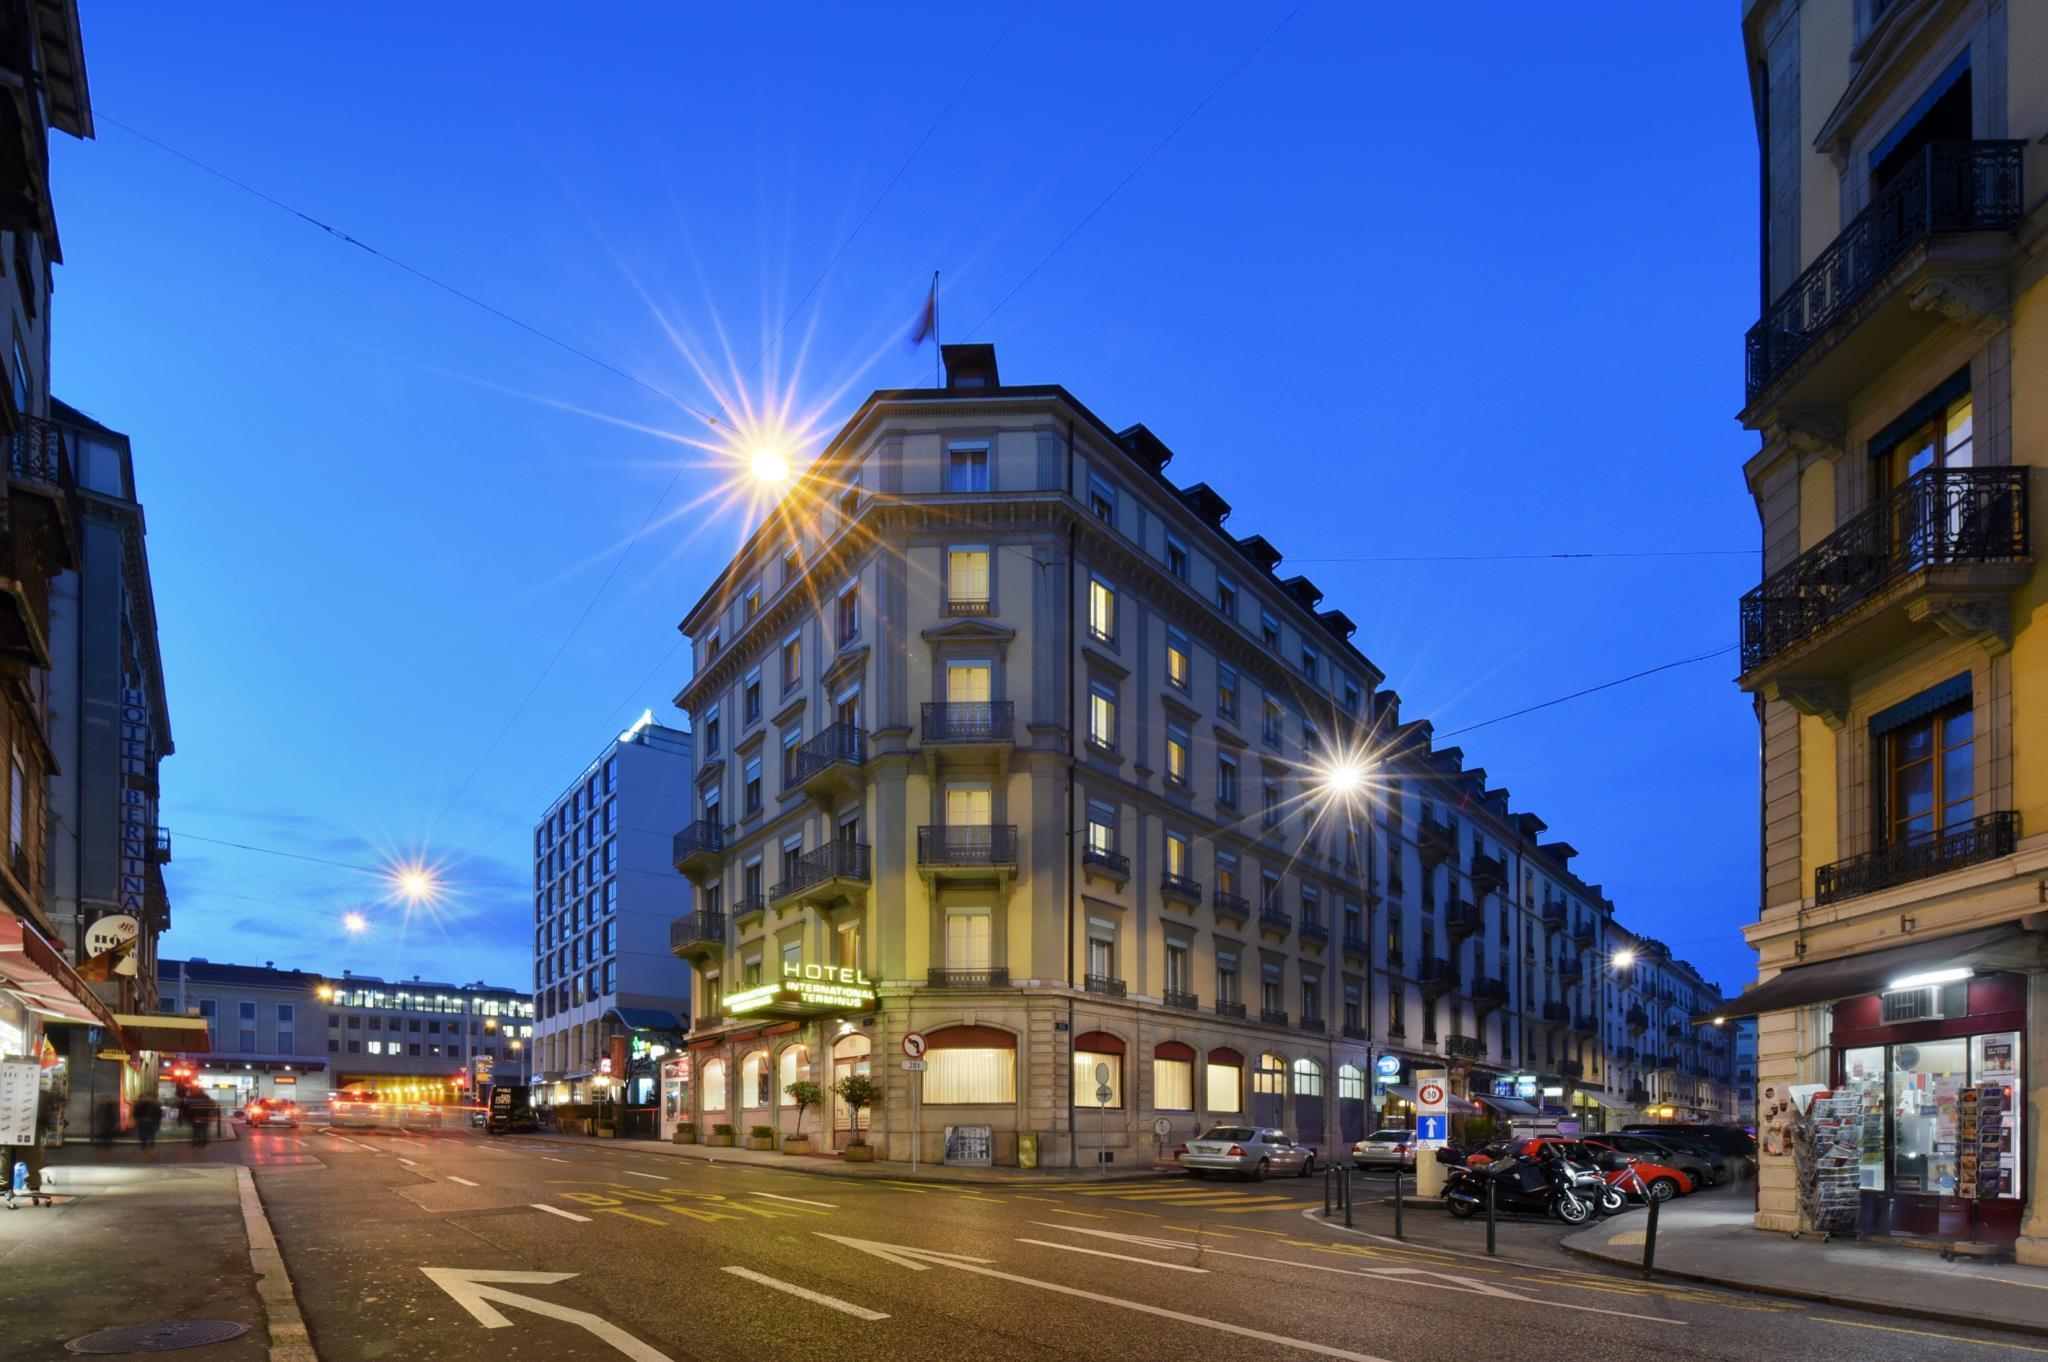 Hotel International And Terminus